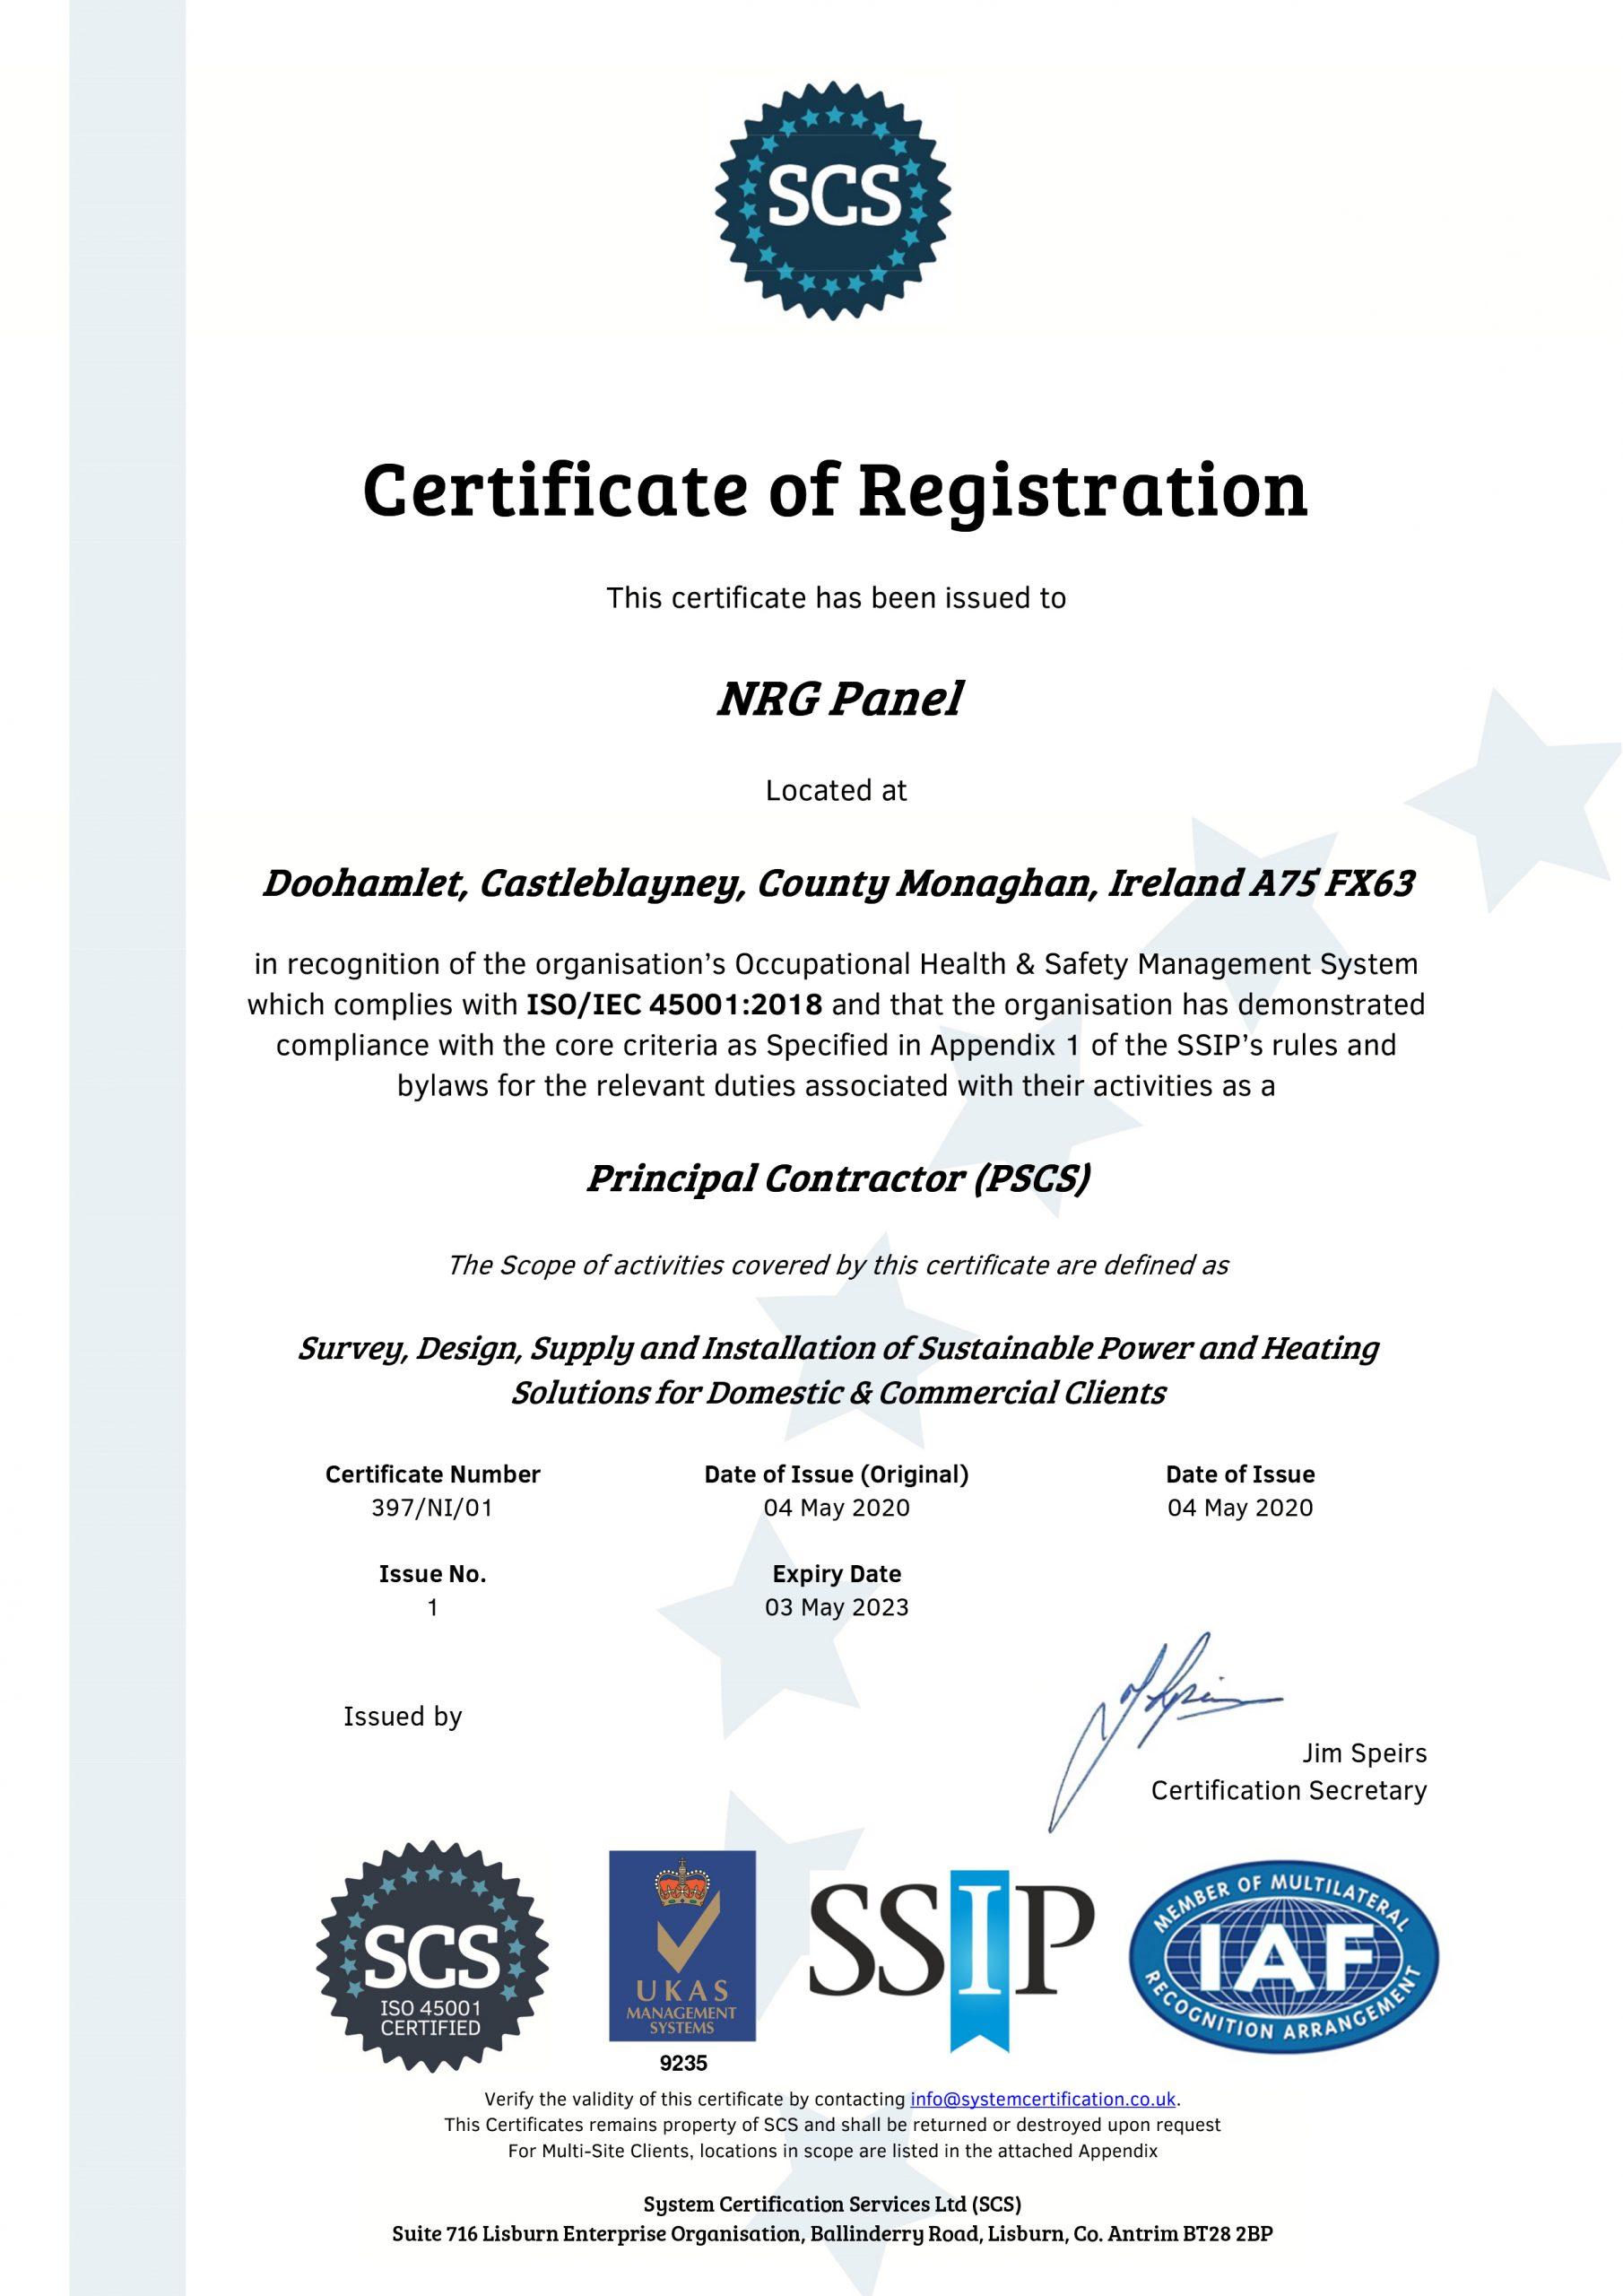 iso accreditation - nrg panel